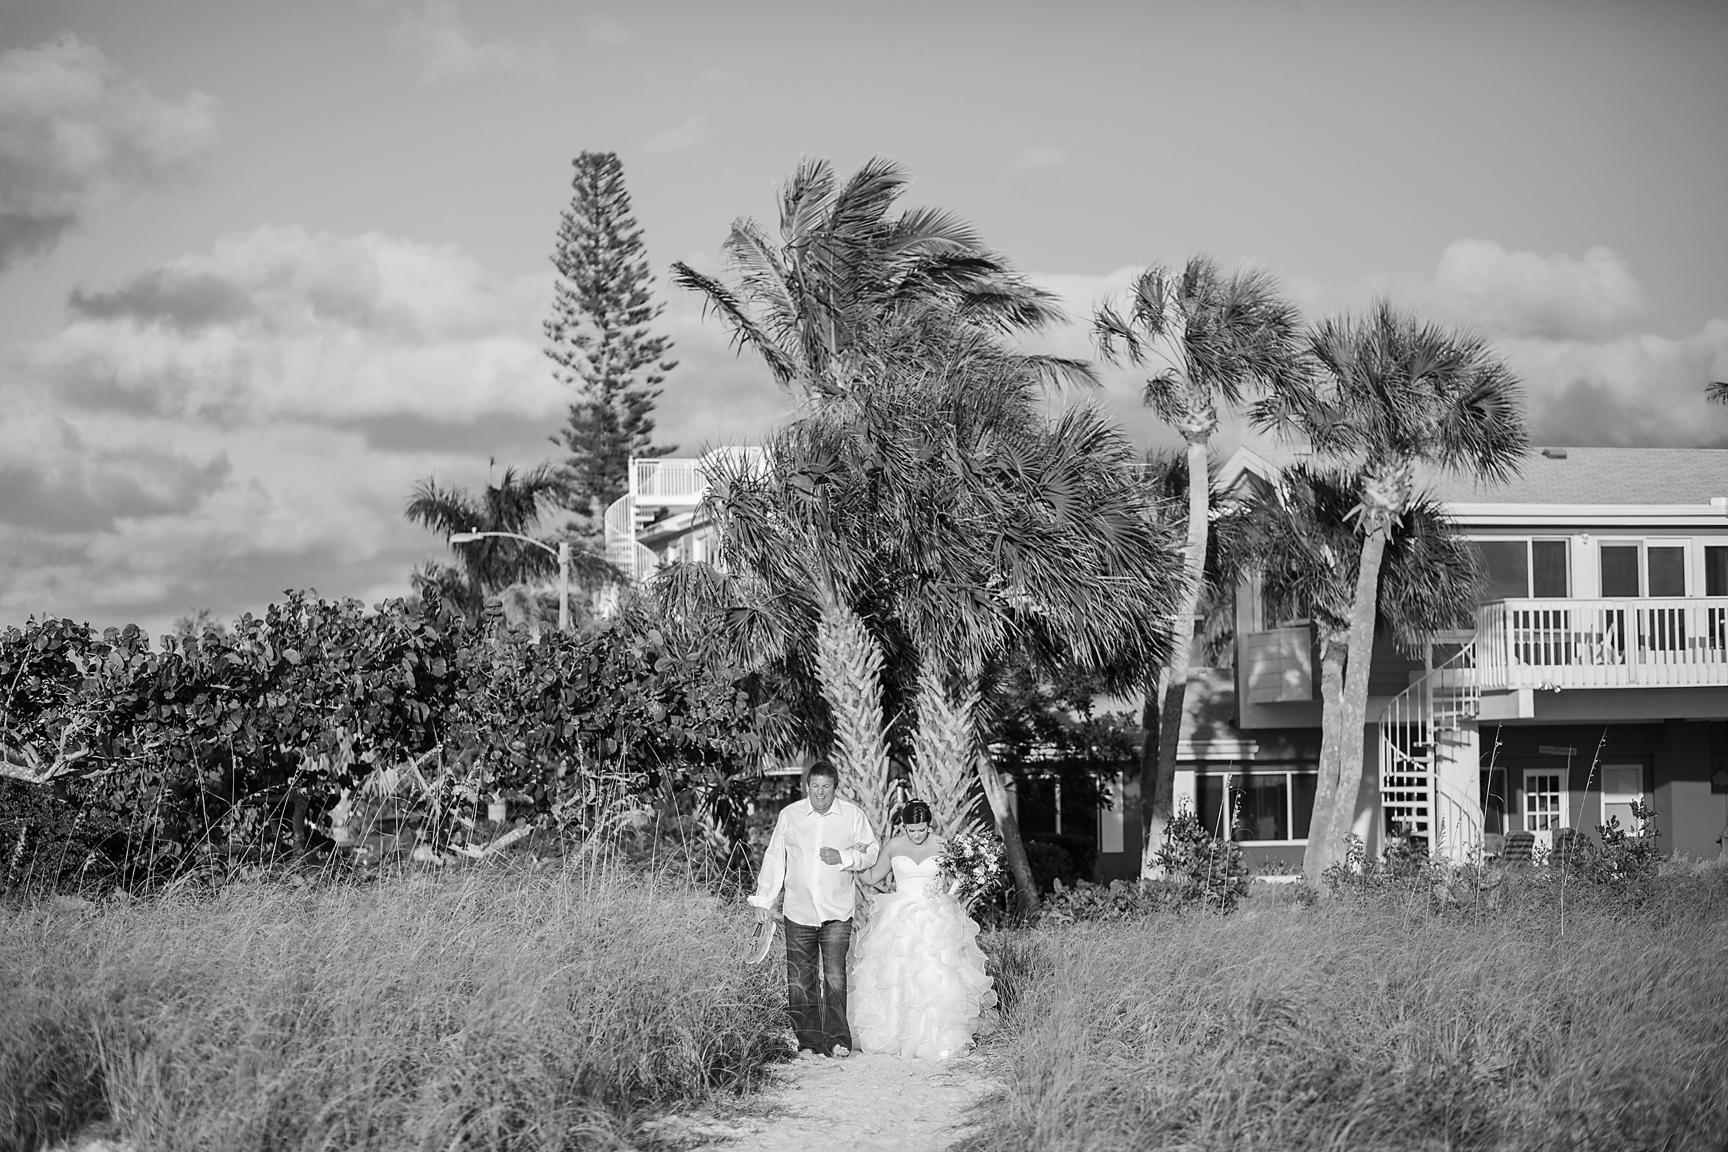 Bailey + Chalin - Anna Maria Island Wedding Photographer - Destination Wedding Photography - Emily & Co. Photography - Beach Wedding Photography (19).jpg